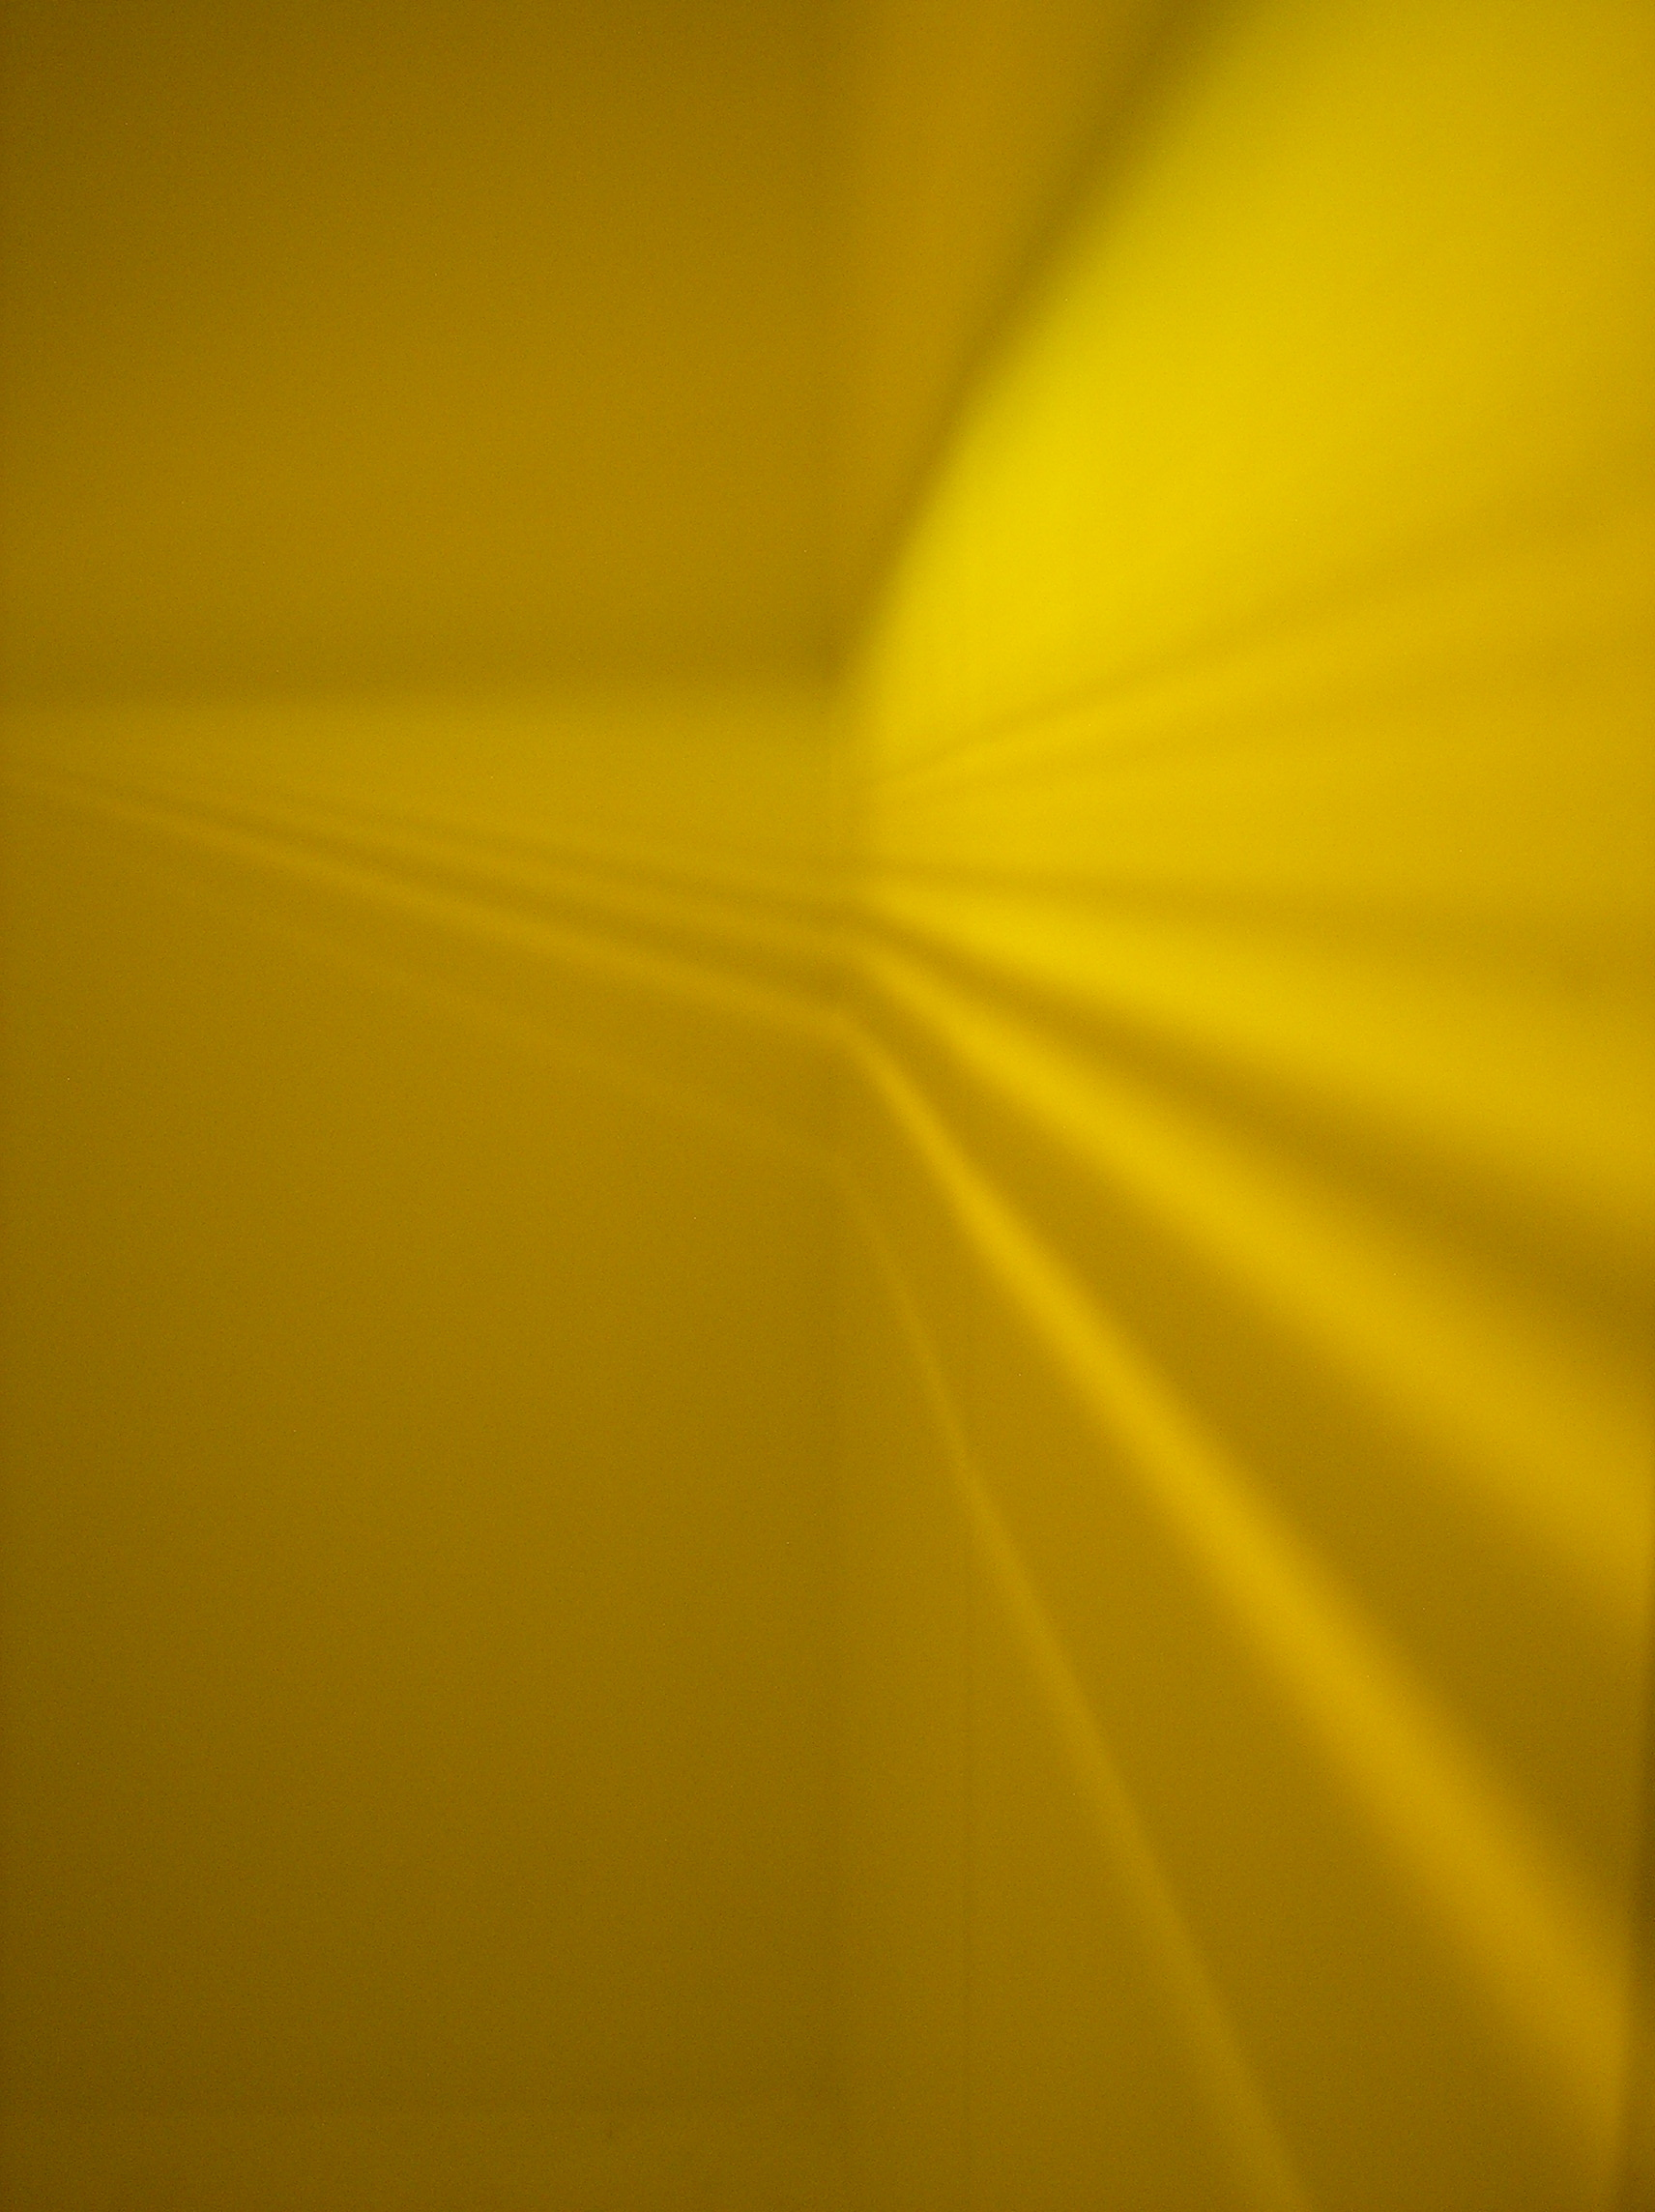 4. Yellow Chamber 1 (External View), Mixed Media Installation, 2007.jpg